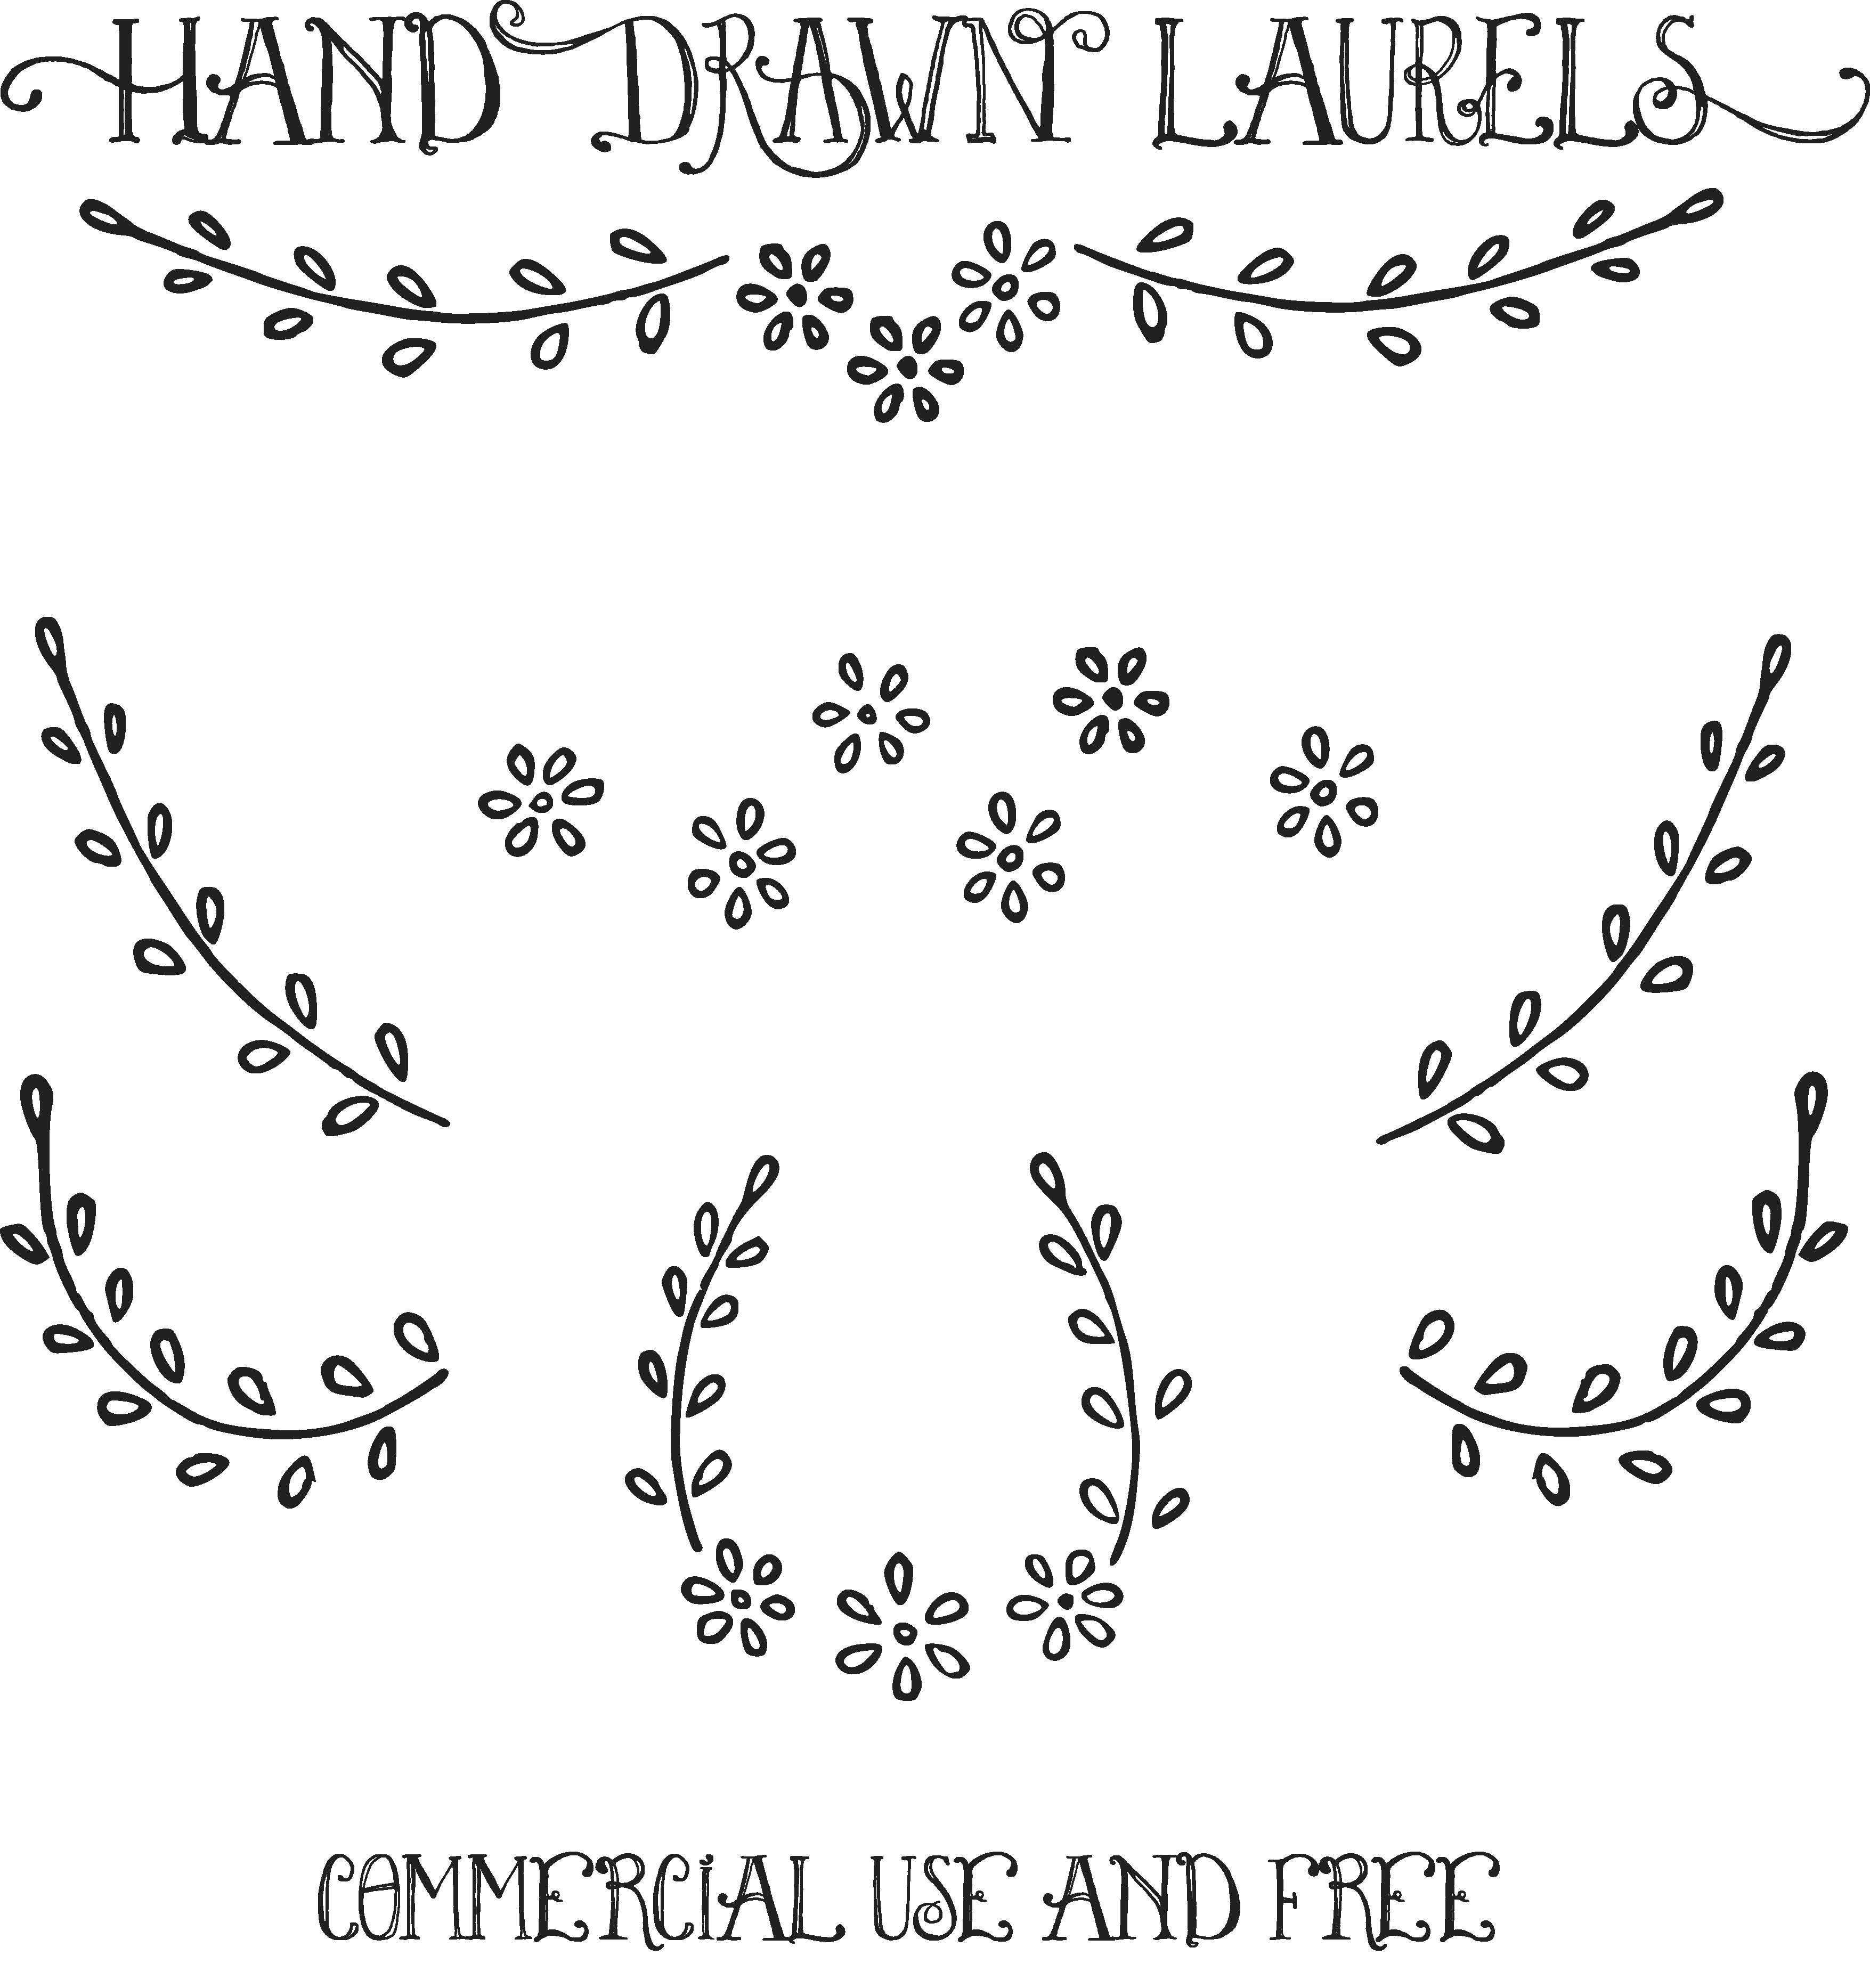 Perky turkey clipart transparent download Royalty Free Images Hand Drawn Laurels Clip Art Vectors Oh So ... transparent download